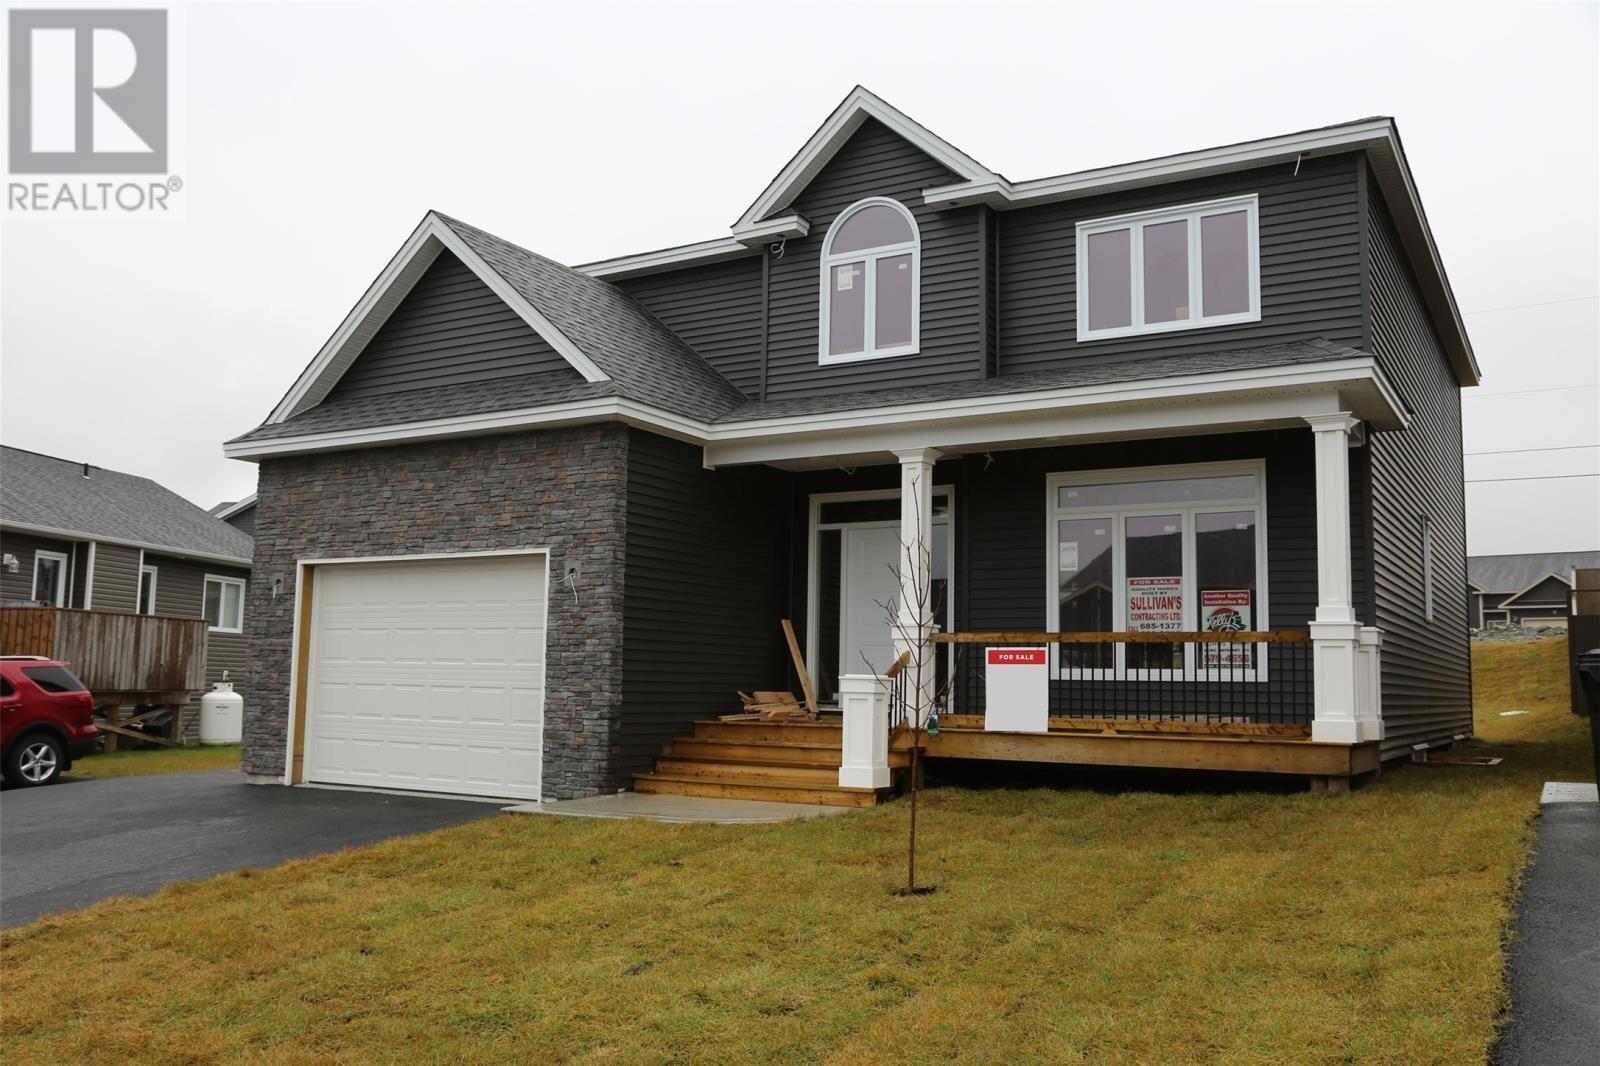 House for sale at 50 Cherrybark Cres St. John's Newfoundland - MLS: 1214253